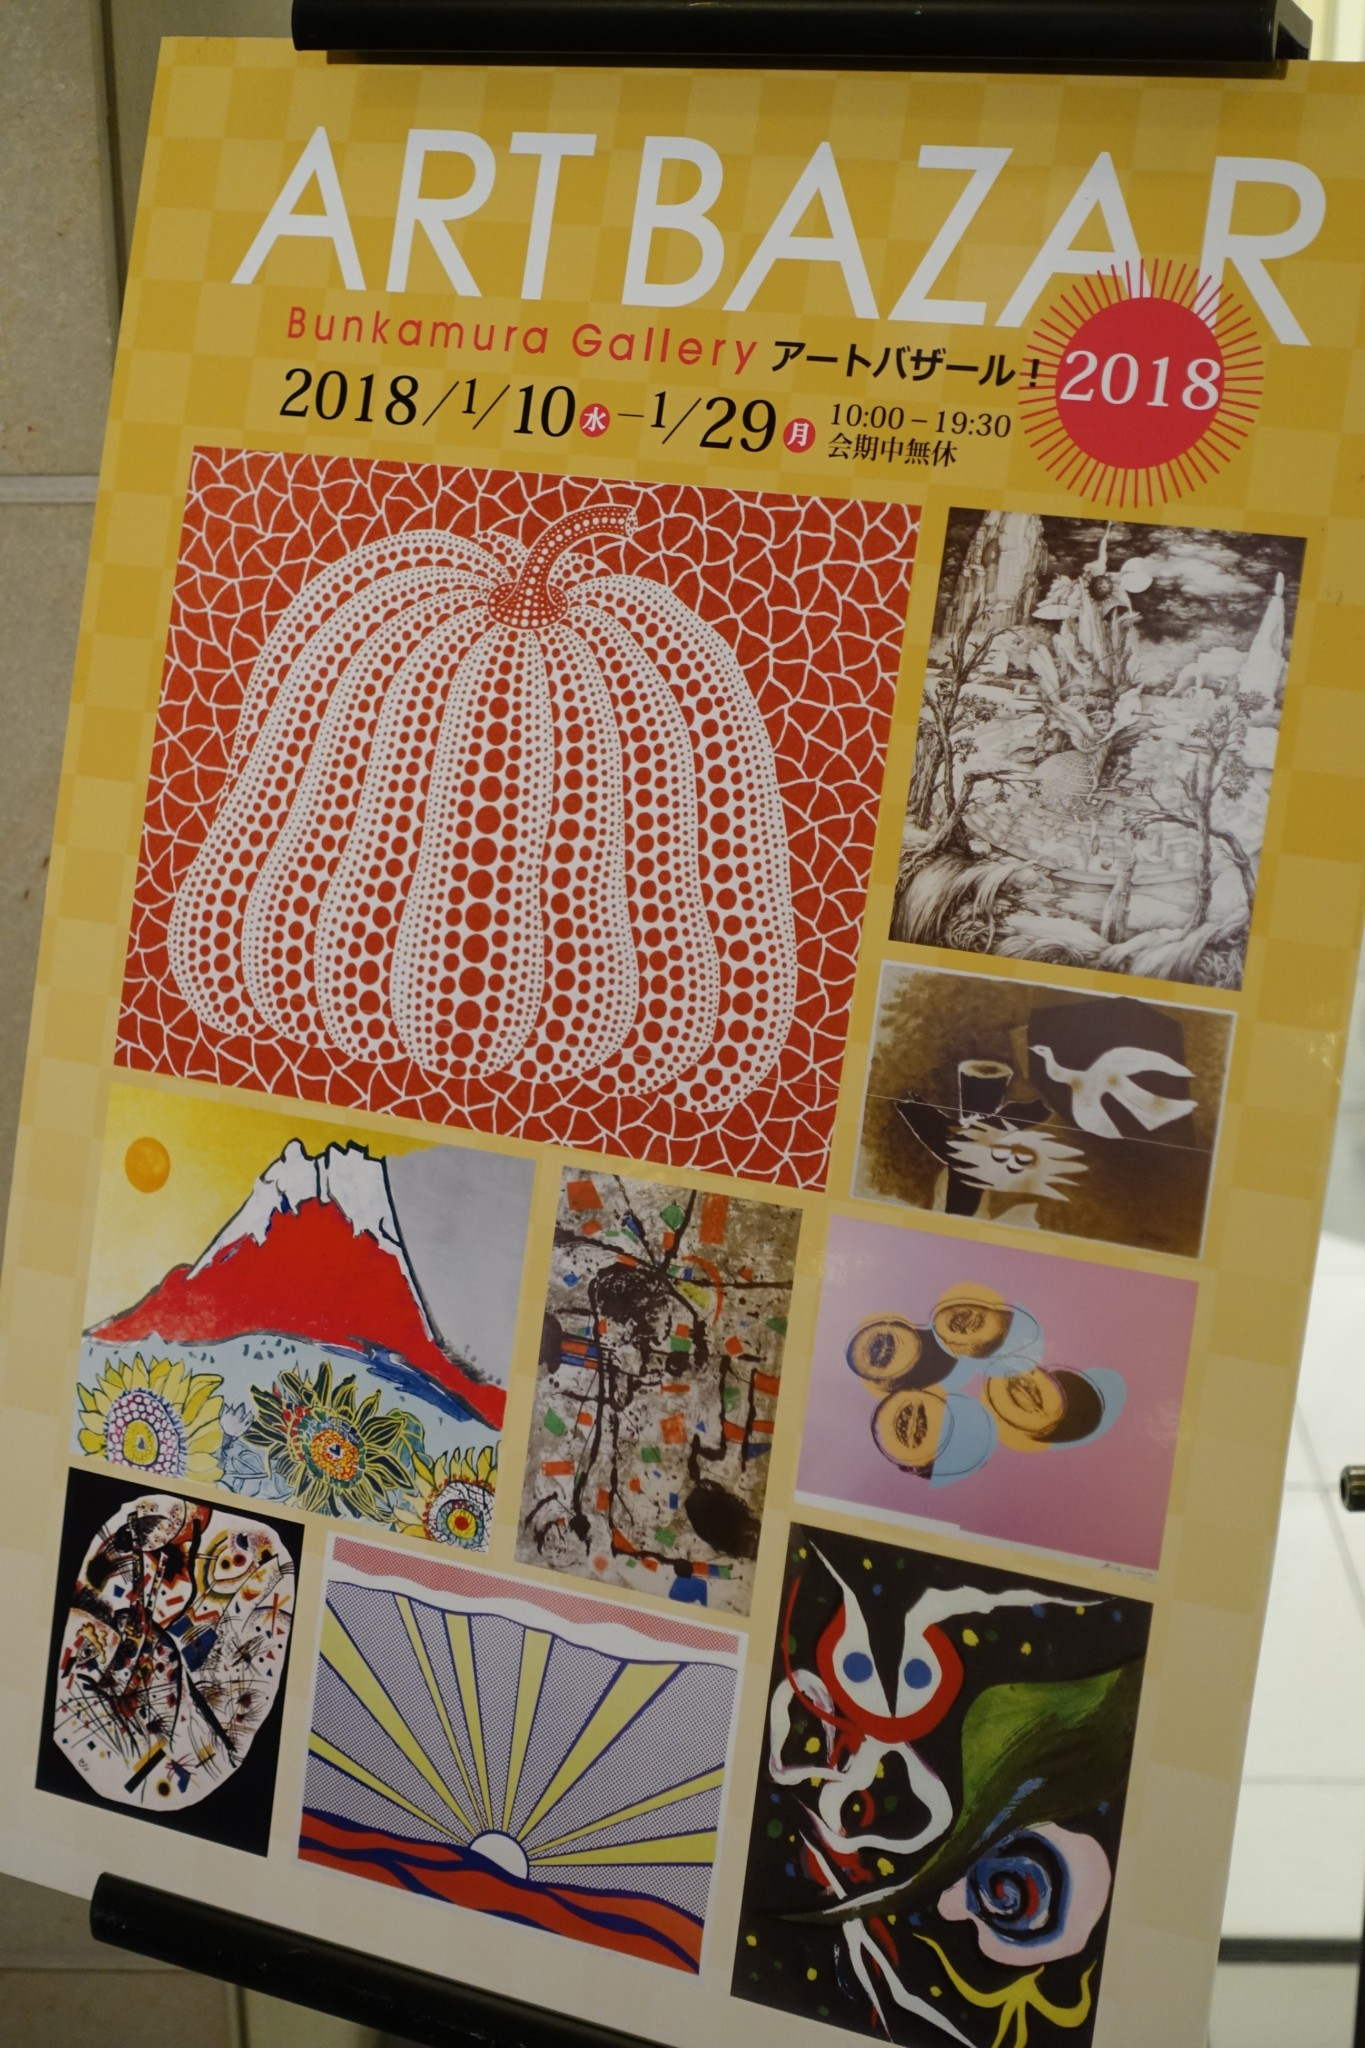 Bunkamura Galleryアートバザール!2018